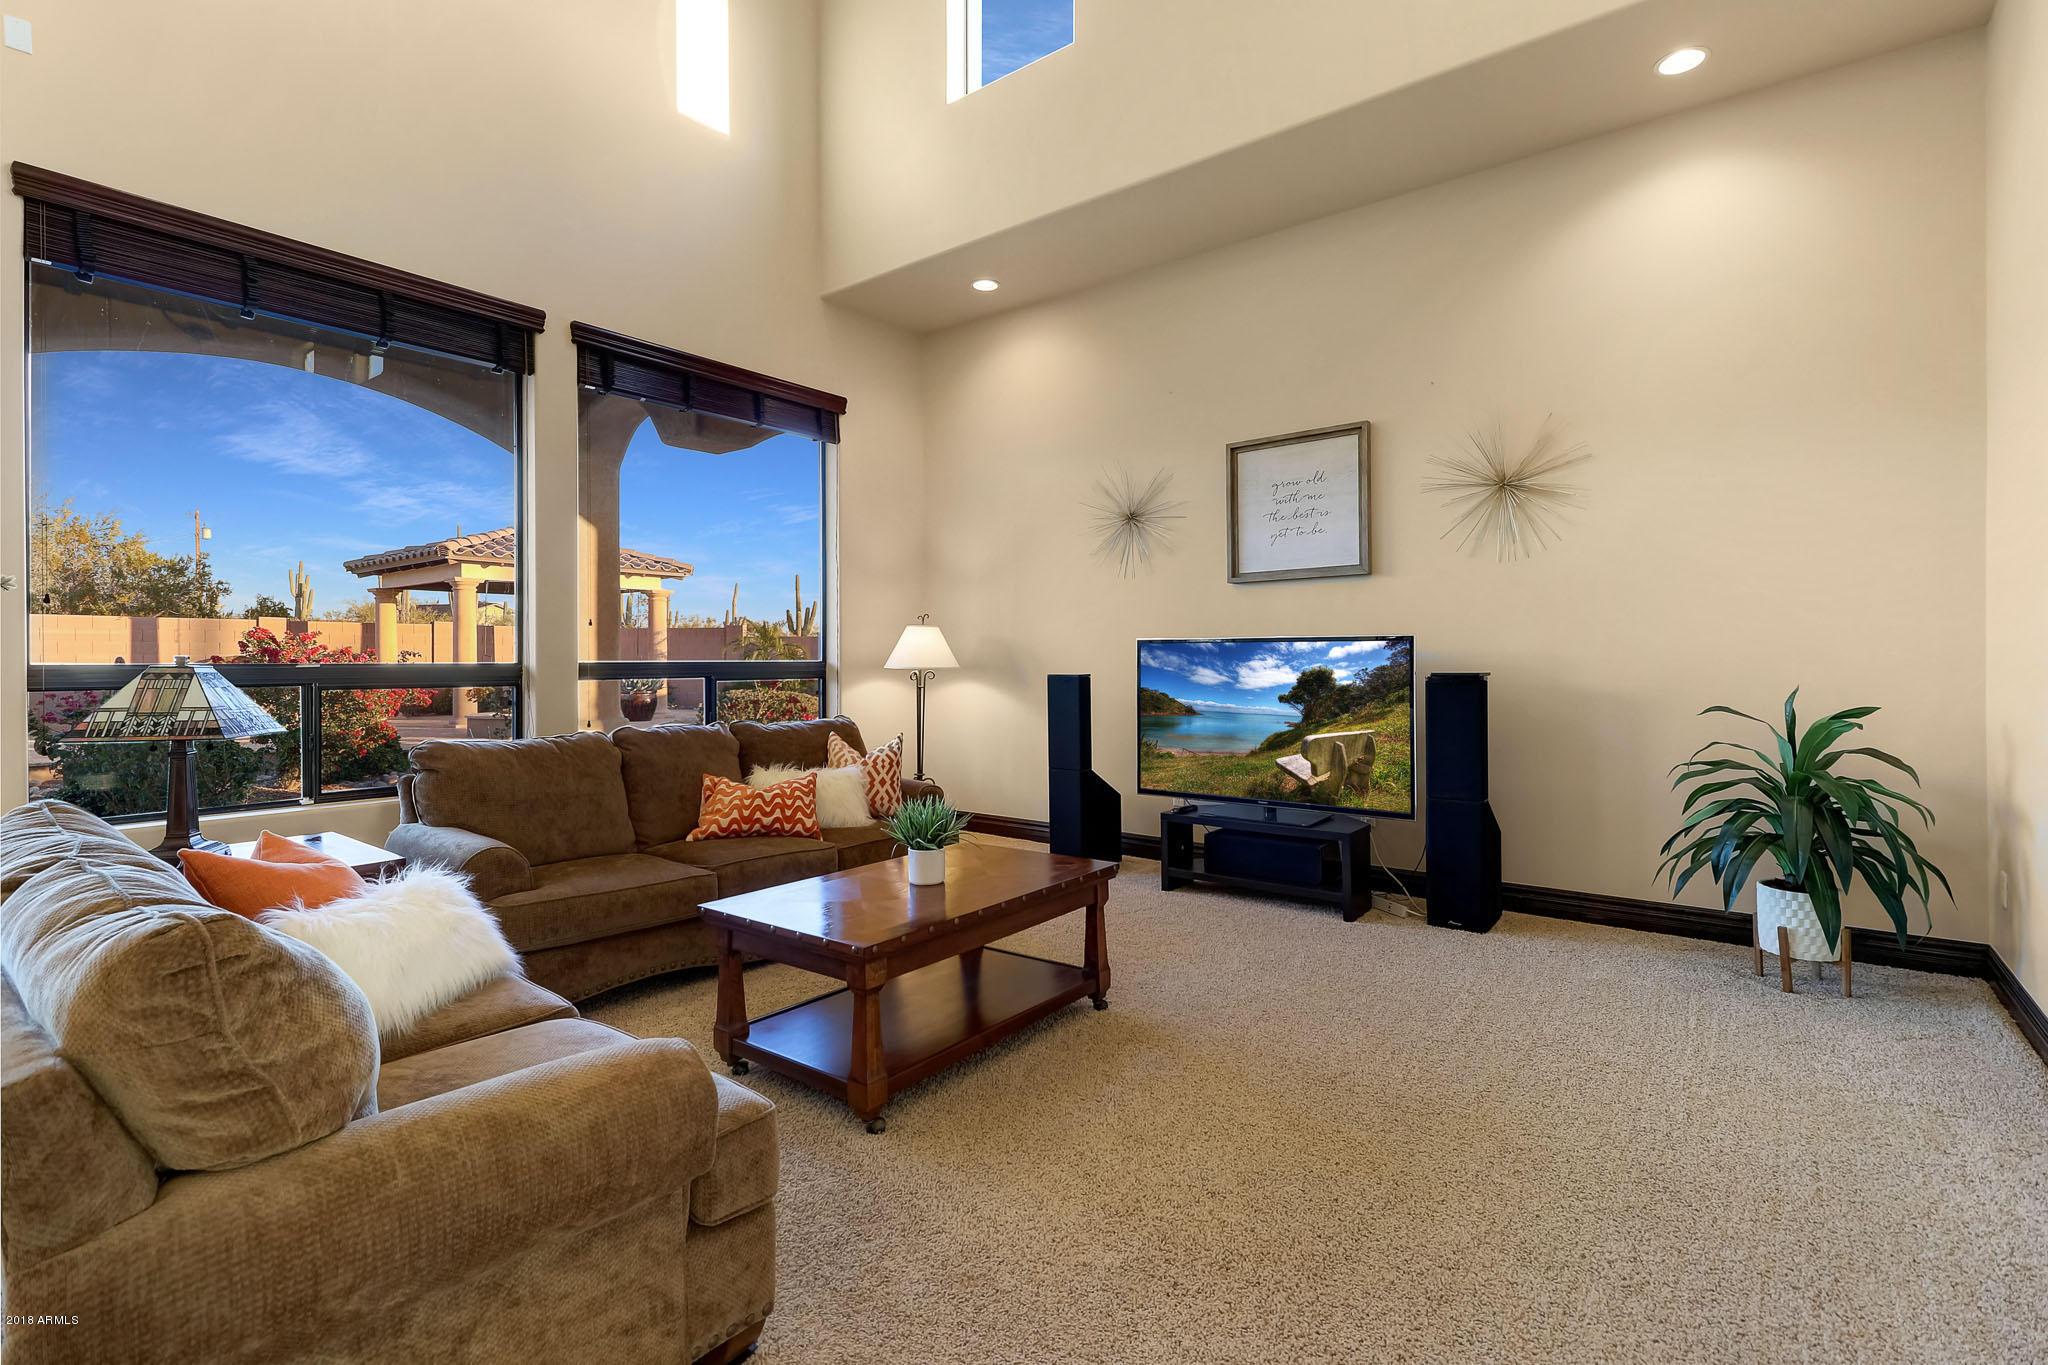 3119 N 82ND Way Mesa, AZ 85207 - MLS #: 5857417